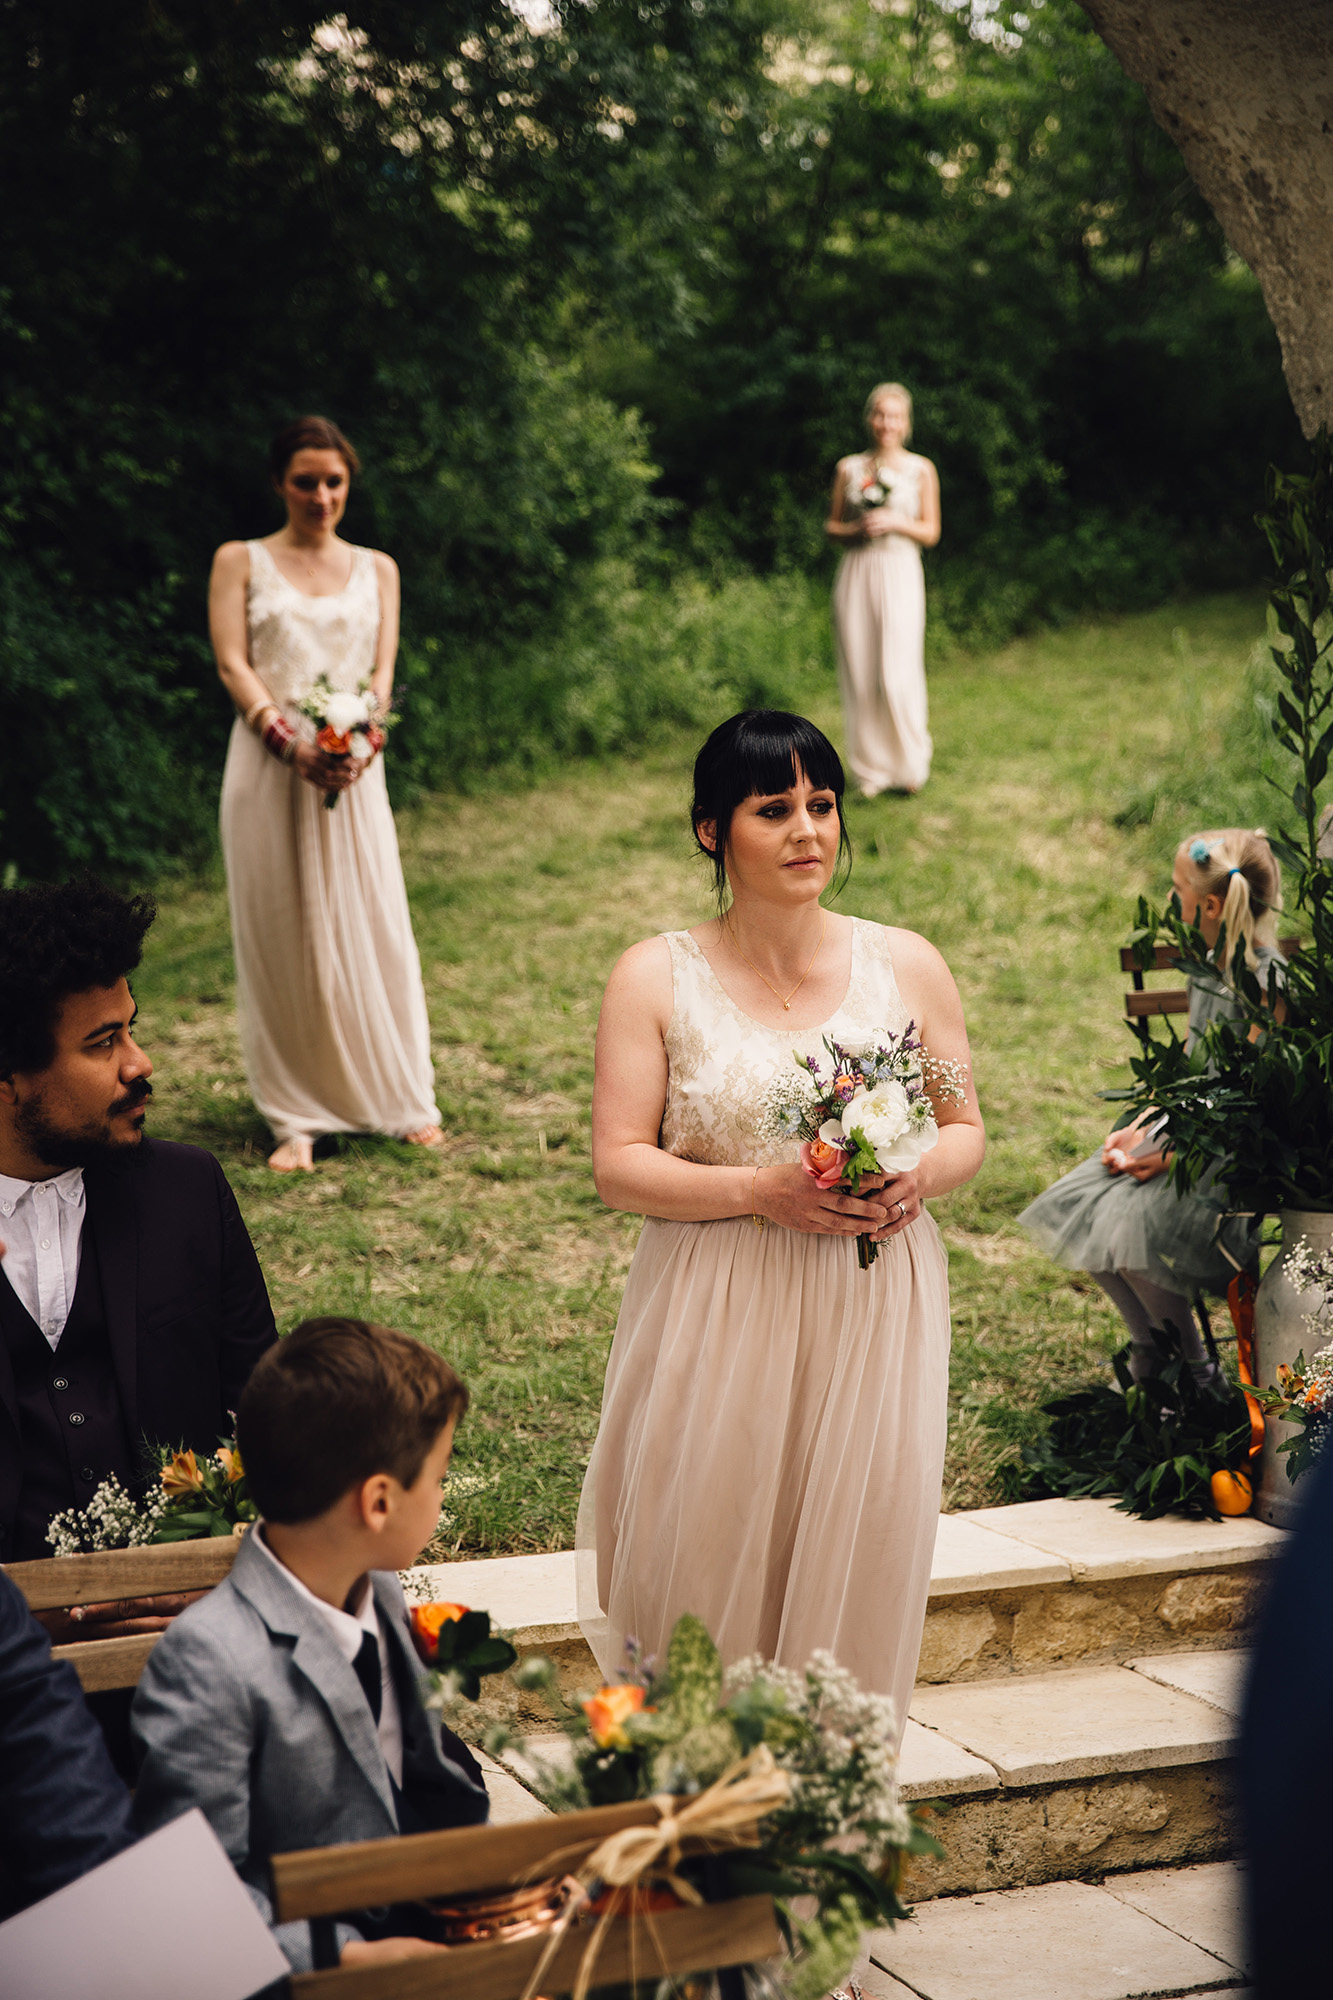 Hannah-Bespoke-Bridesmaids-Bohemian-French-Wedding-Gold-Lace-Susanna-Greening-Designs-Matlock-Derbyshire-7